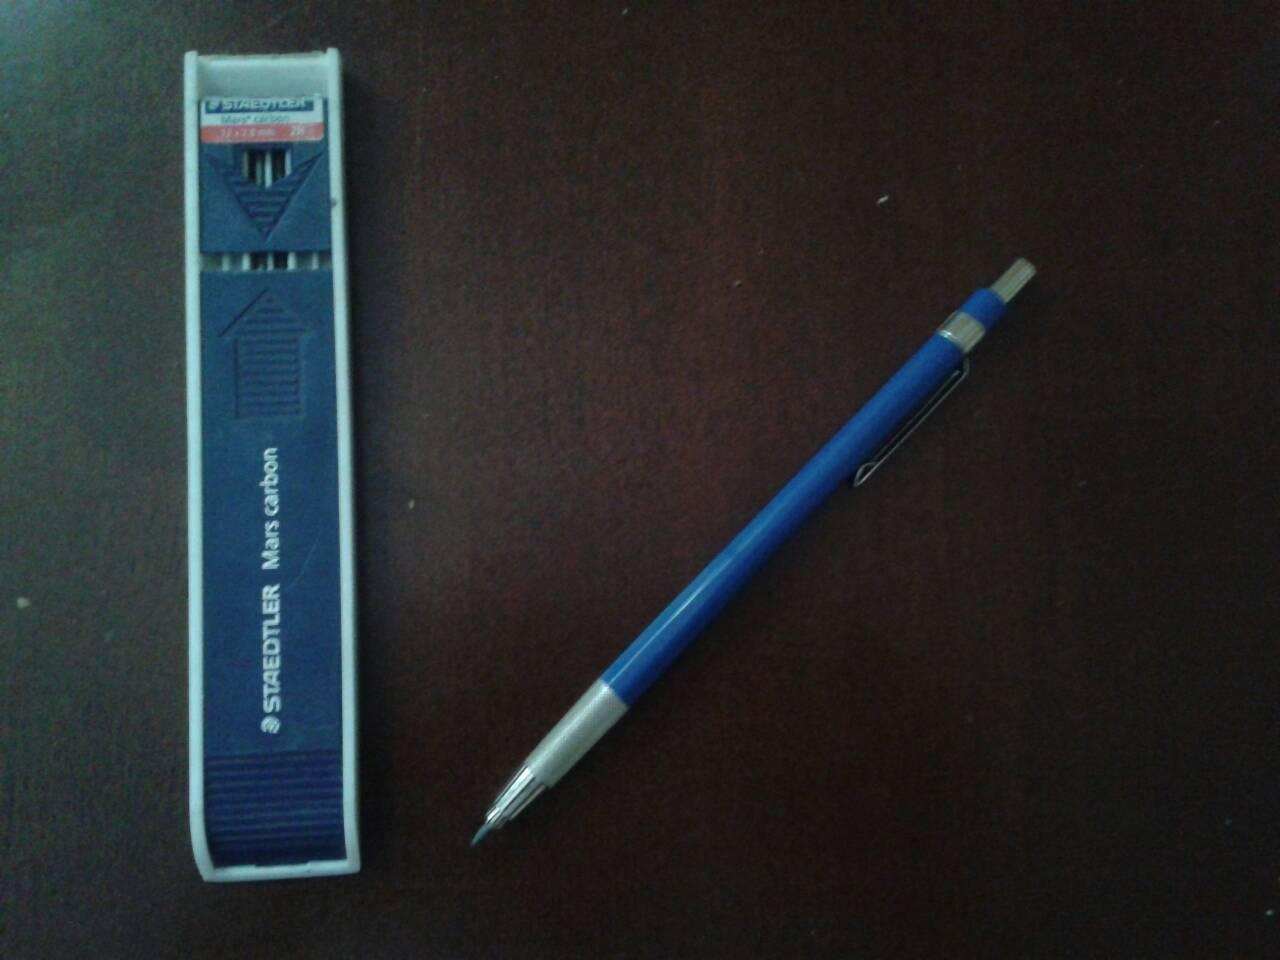 Carpenters Pencils-uploadfromtaptalk1423284048900.jpg